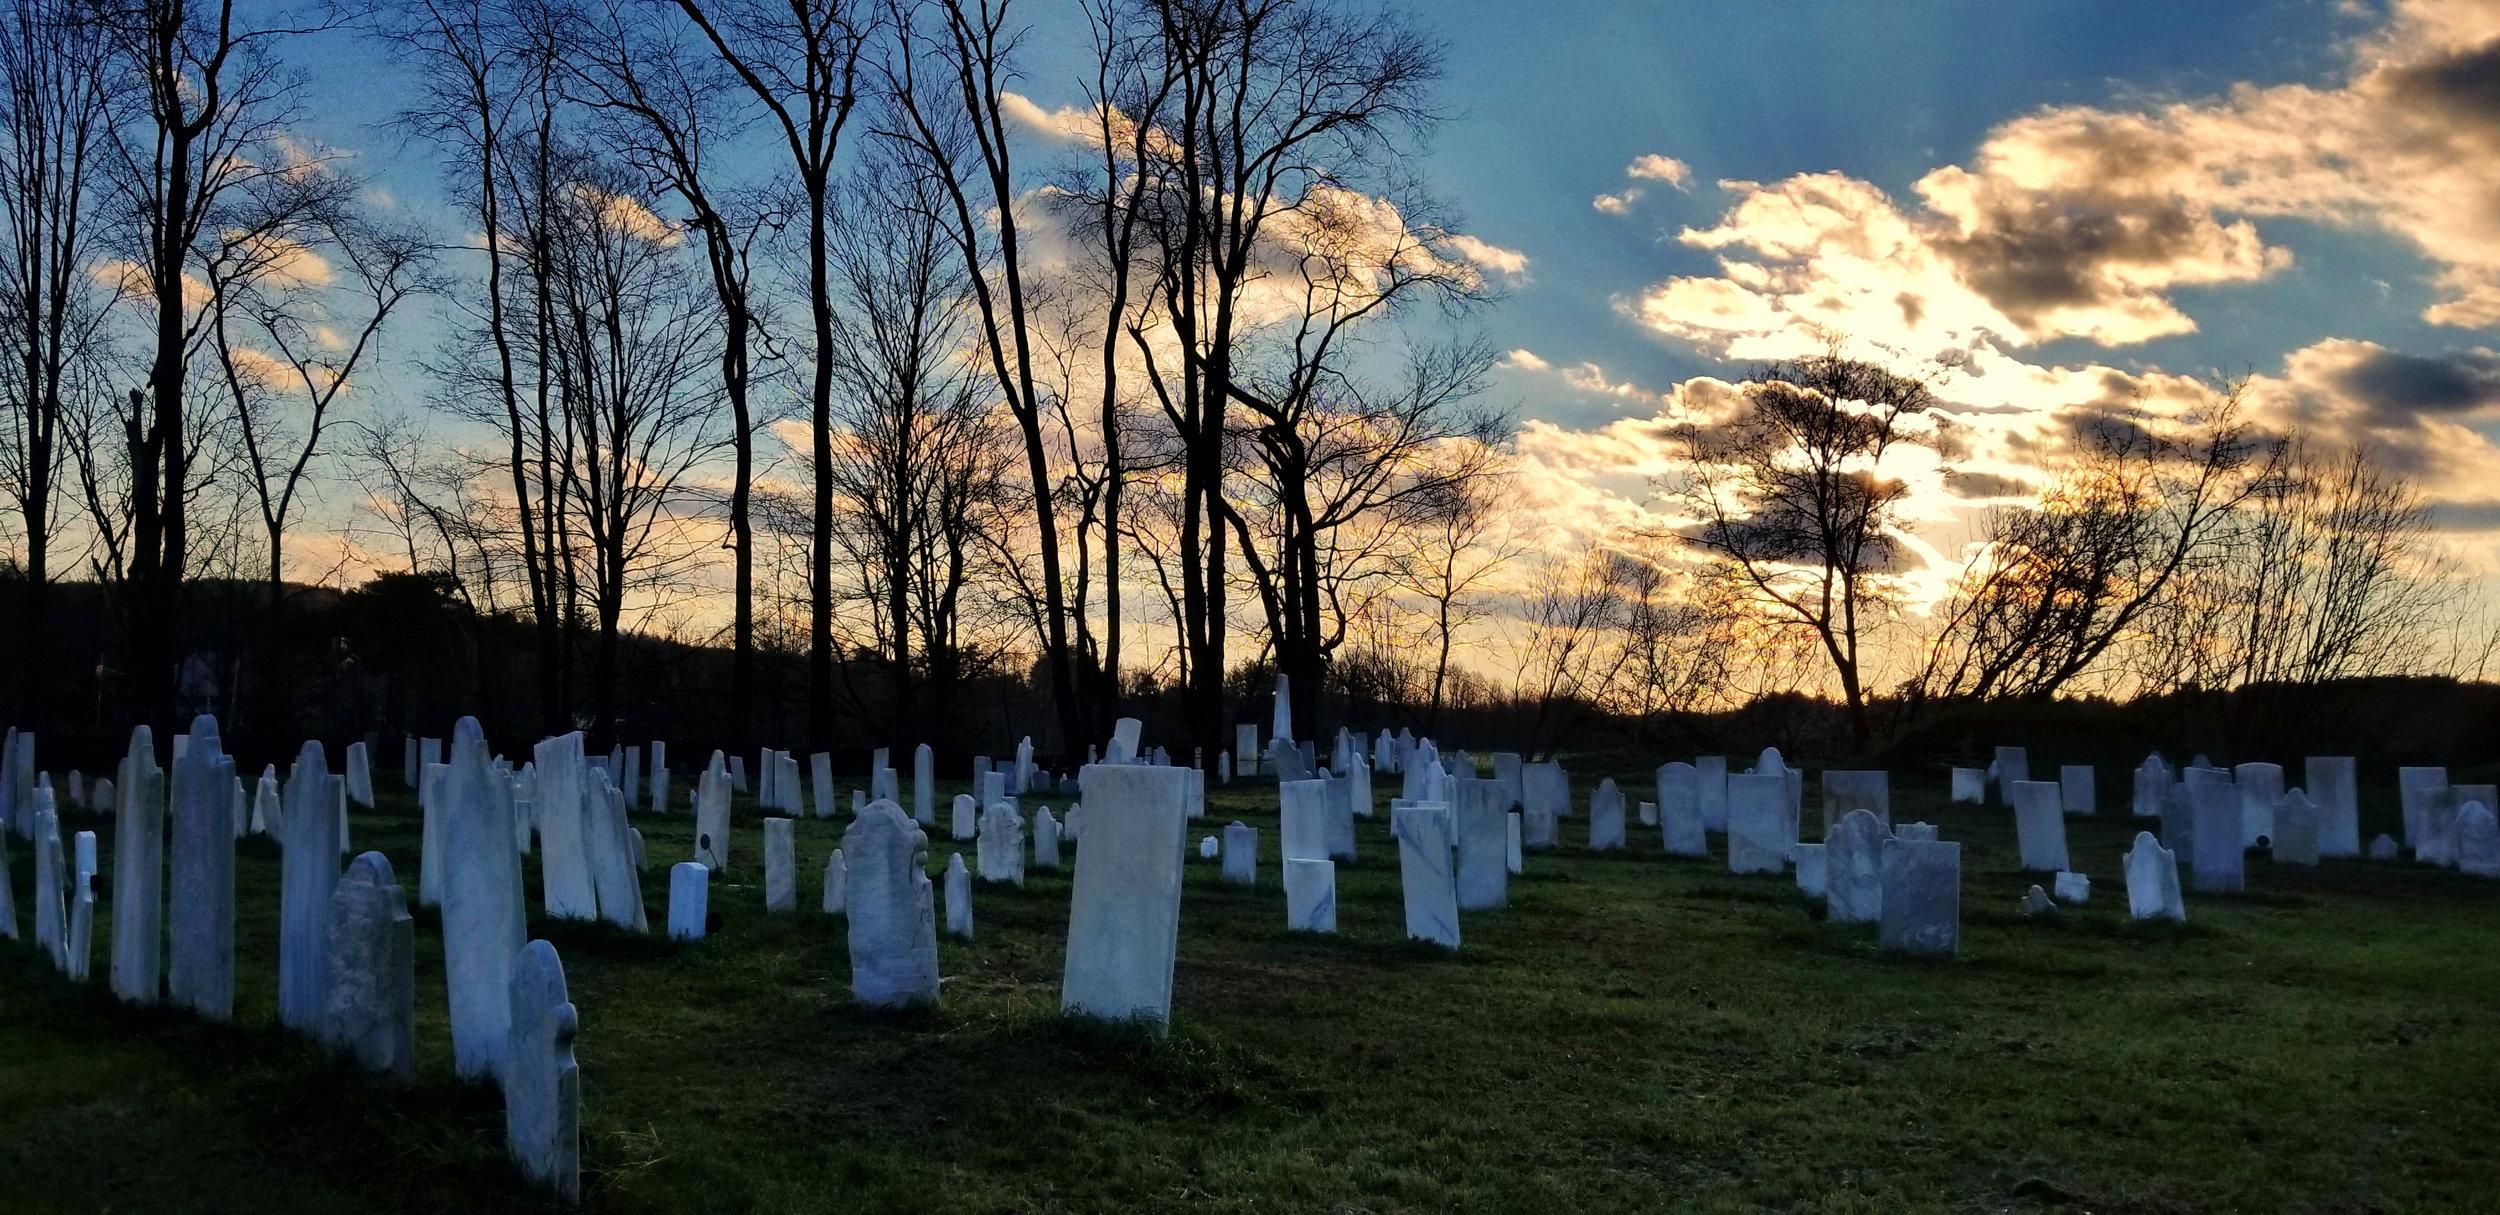 Revolutionary War Cemetery (Old Salem Burying Ground) Archibald St., Salem, New York